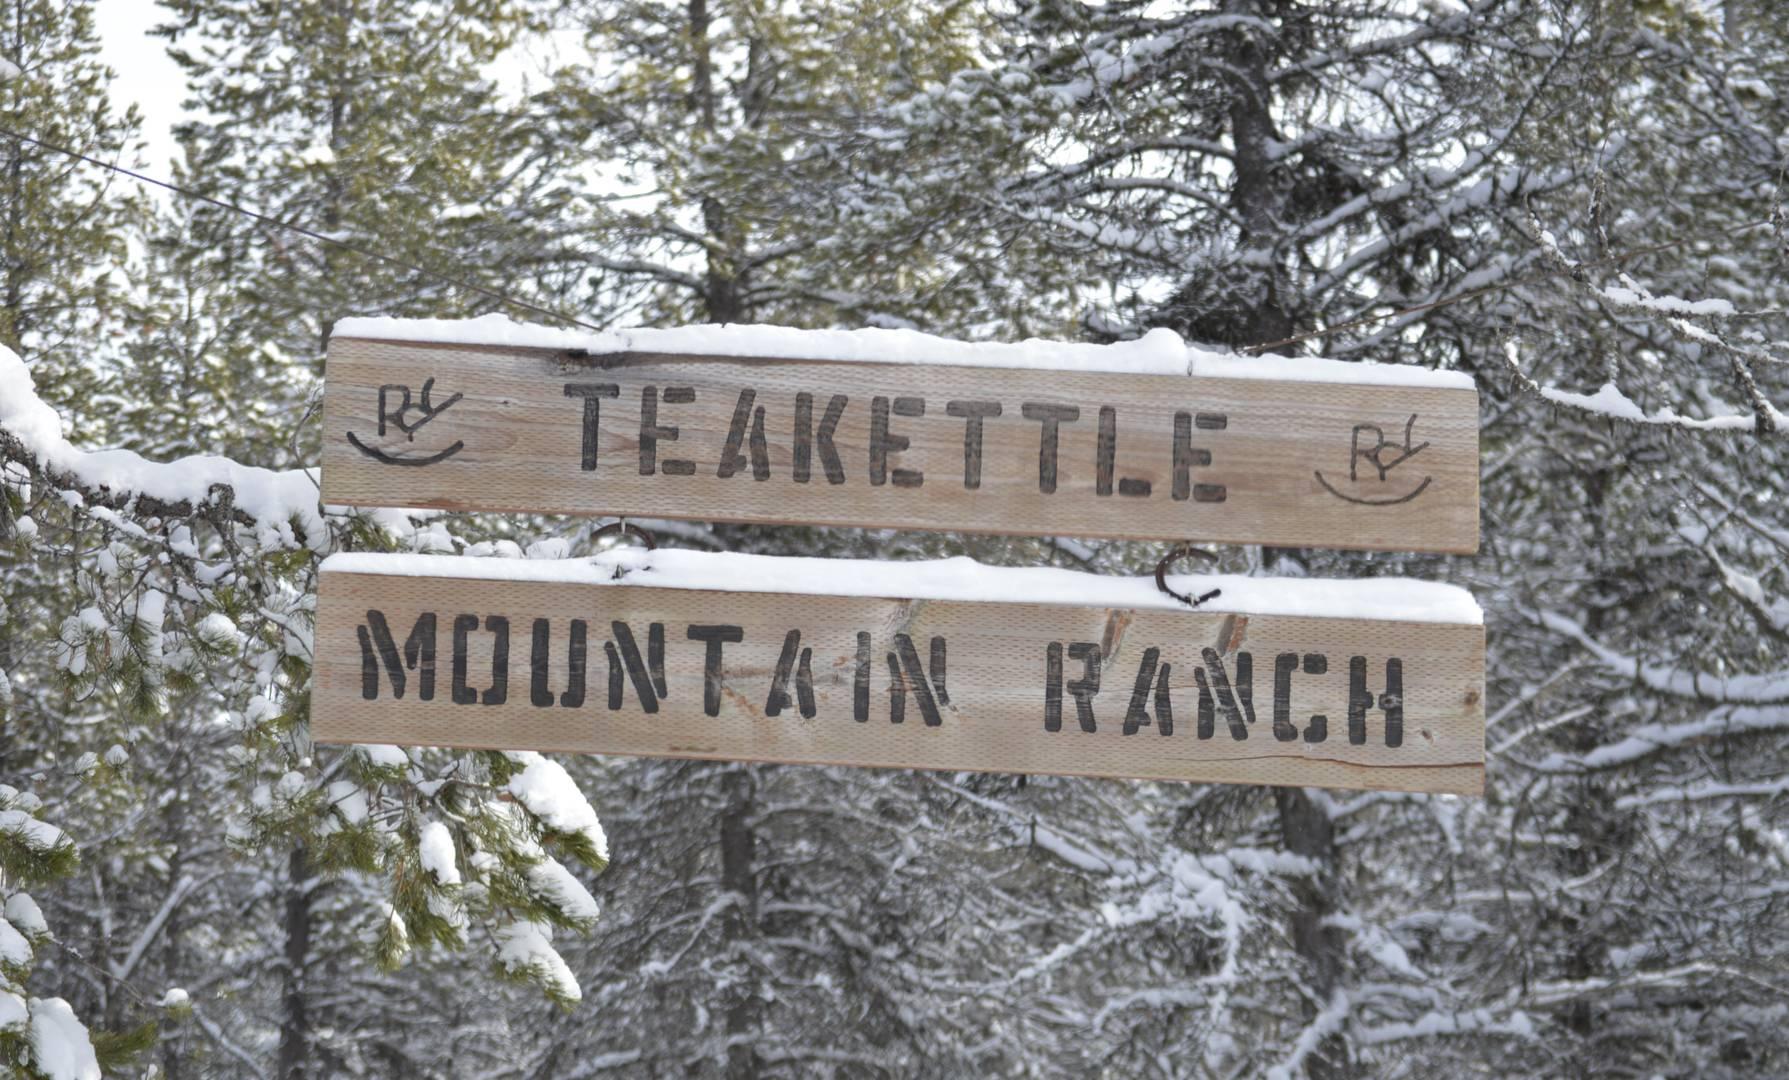 5995 Teakettle Rd Columbia Falls Columbia Falls, MT 59912